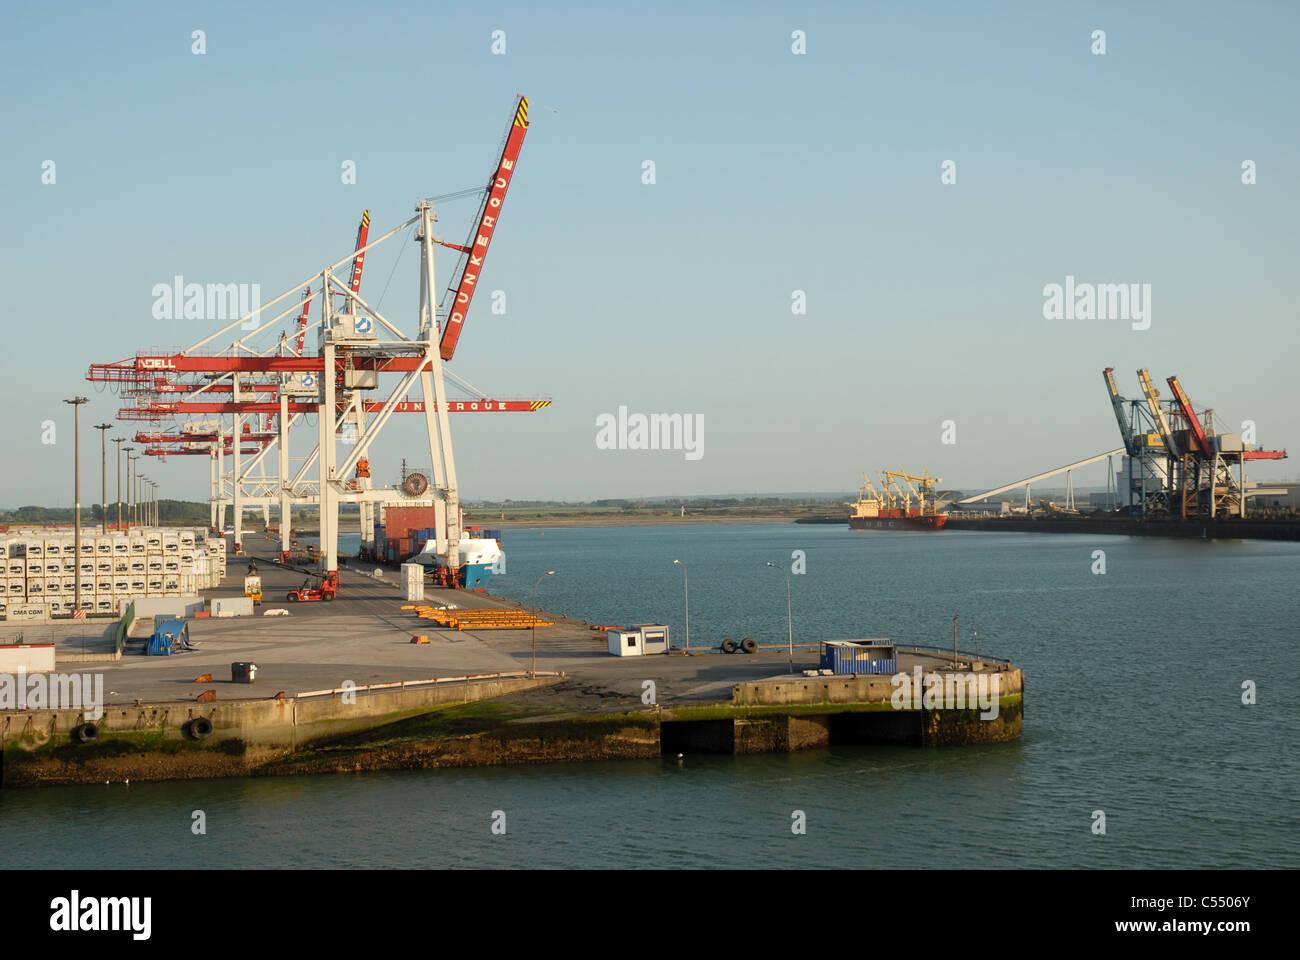 Port de dunkerque france stock photo royalty free image 37603971 alamy - Dunkirk port france address ...